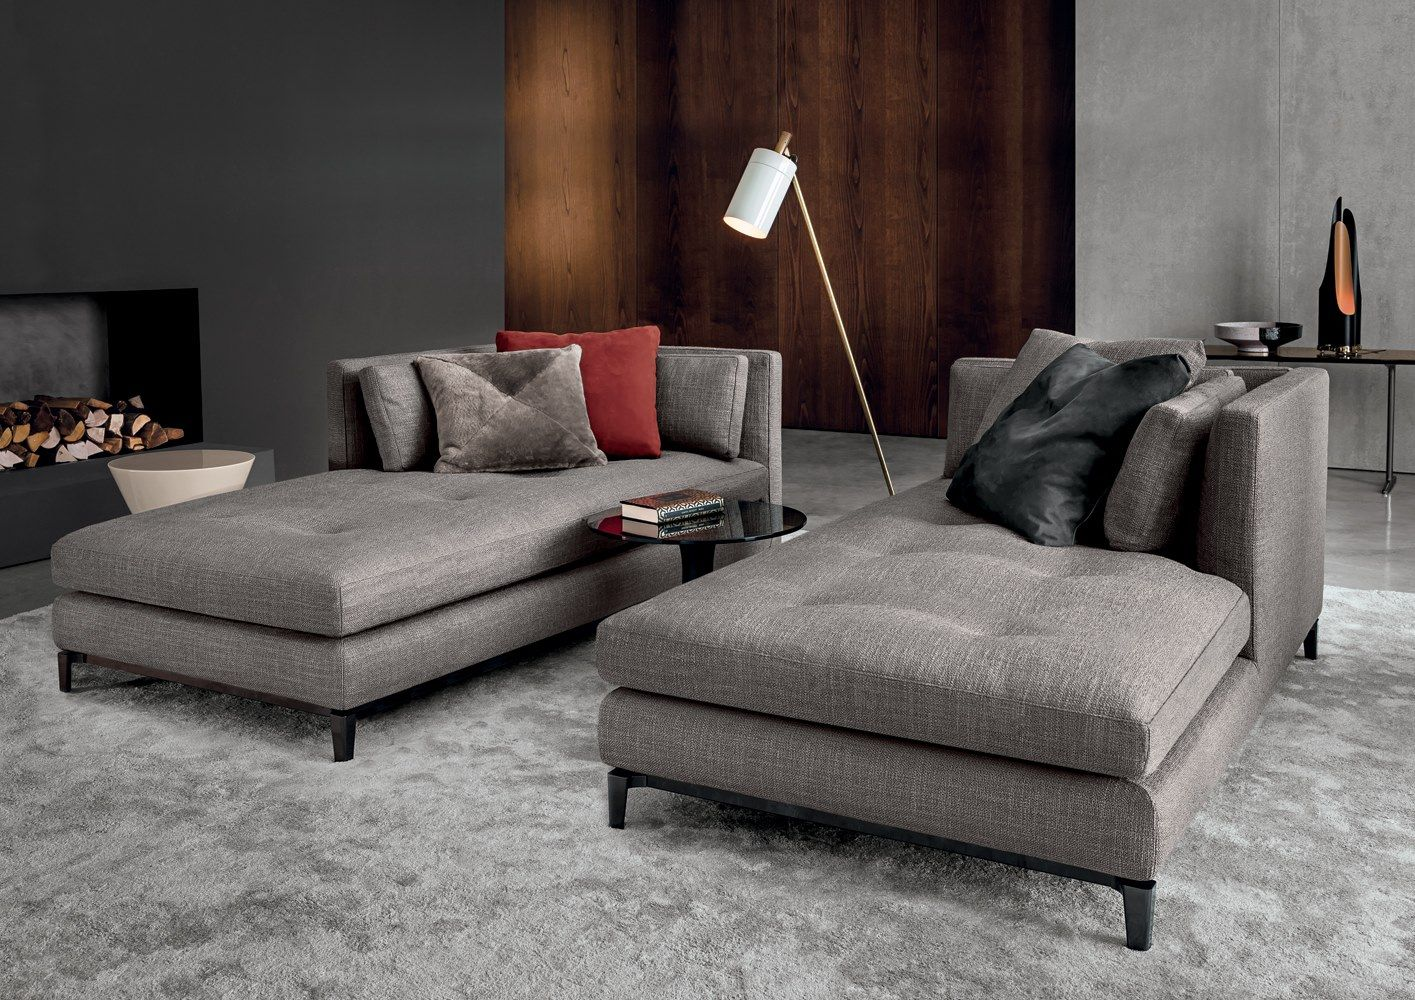 Minotti Sofa Bed Design Bed Design Sofa Design